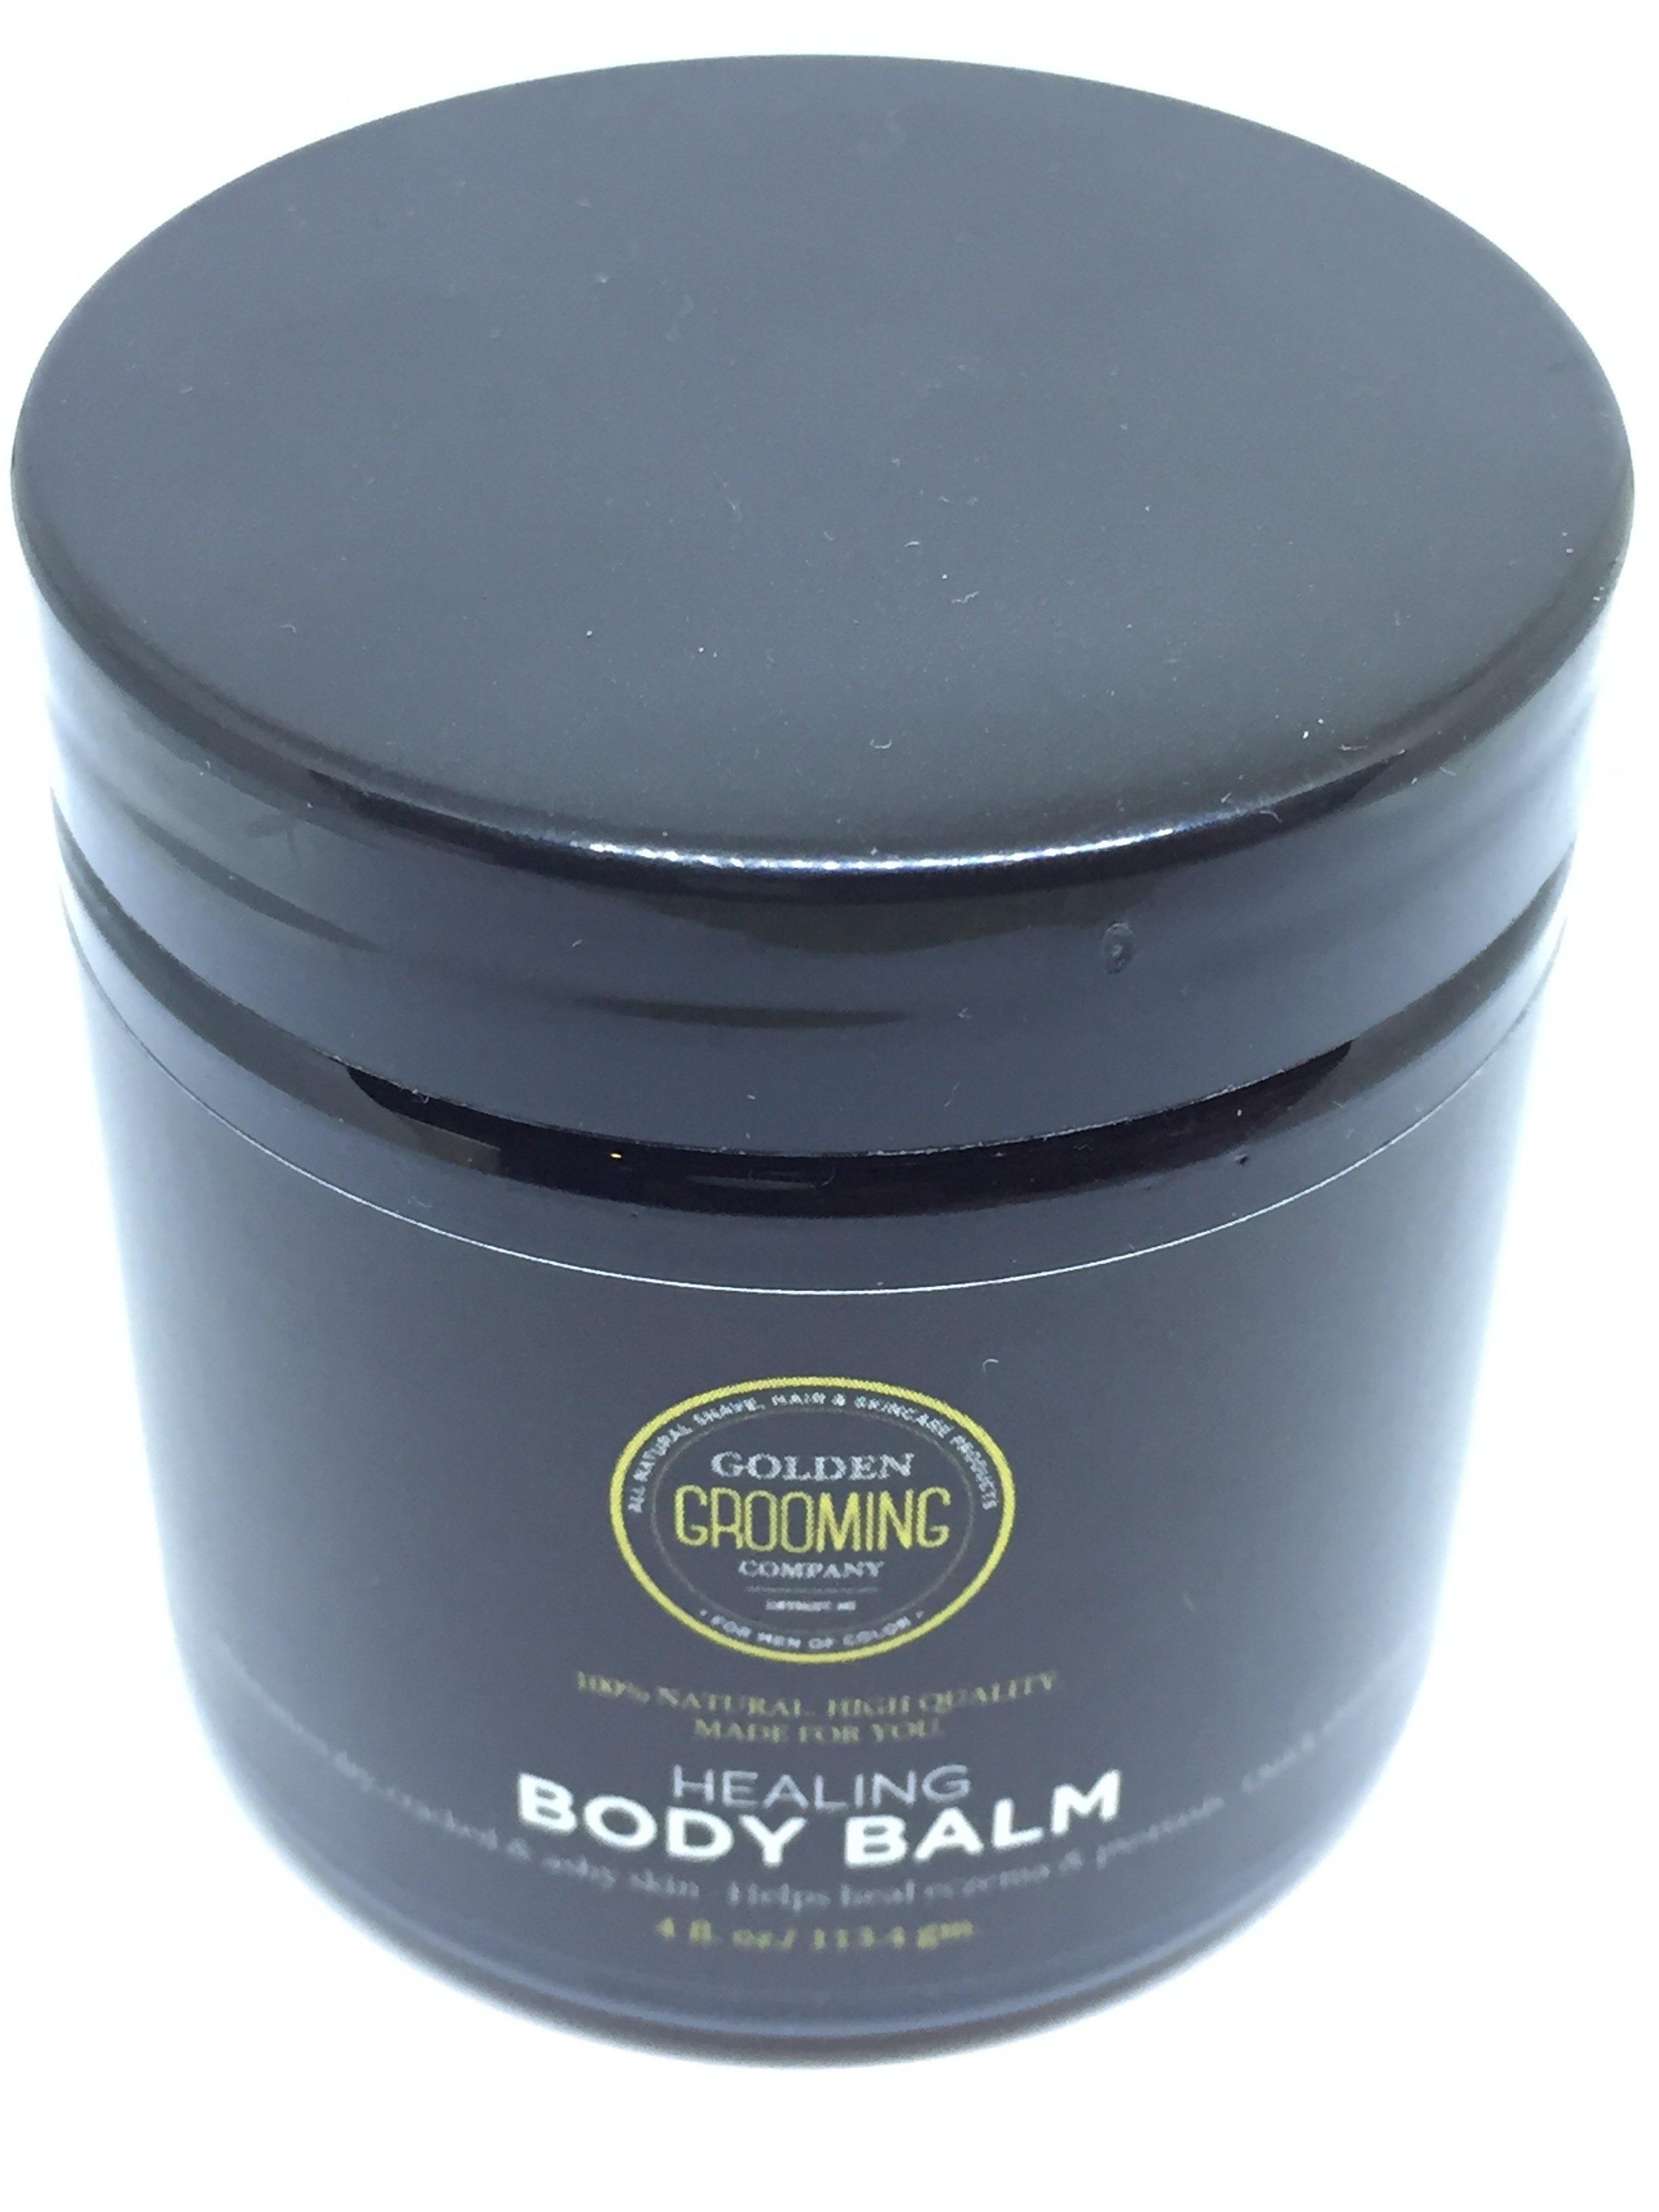 Golden Grooming Body Balm 00067